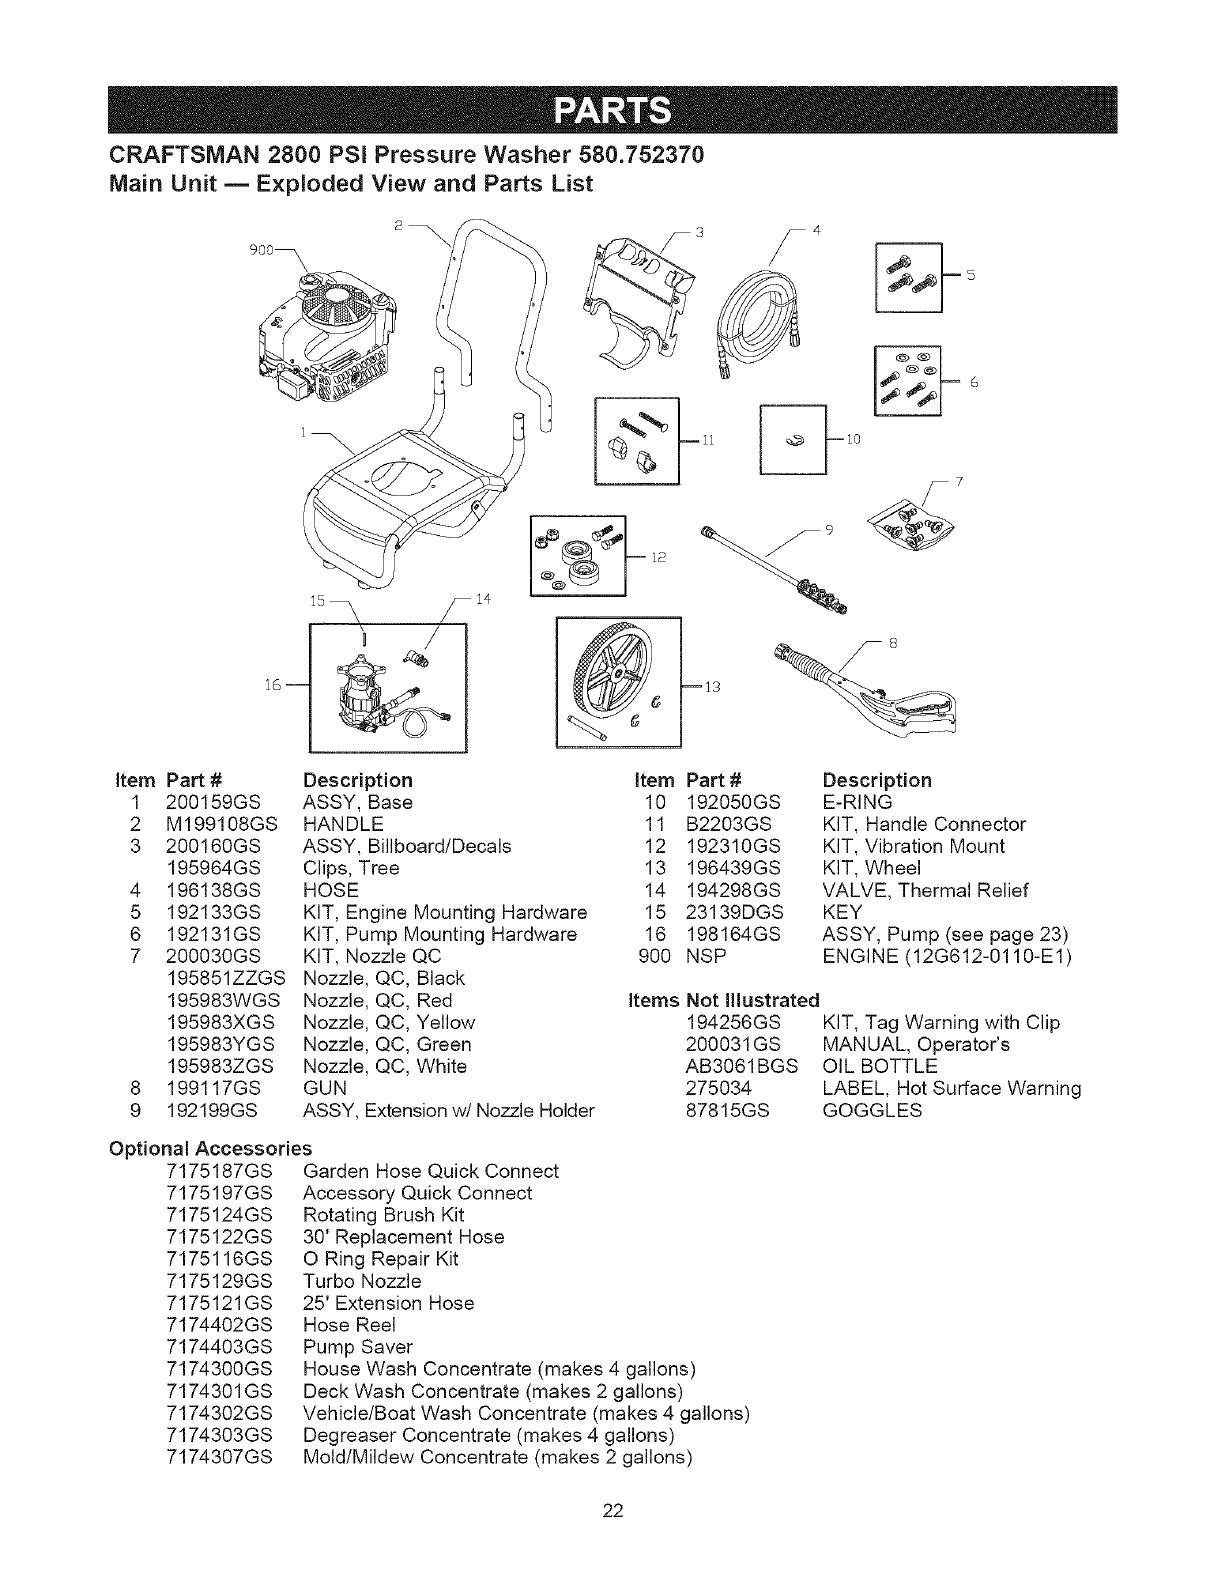 Craftsman 580752370 User Manual PRESSURE WASHER Manuals